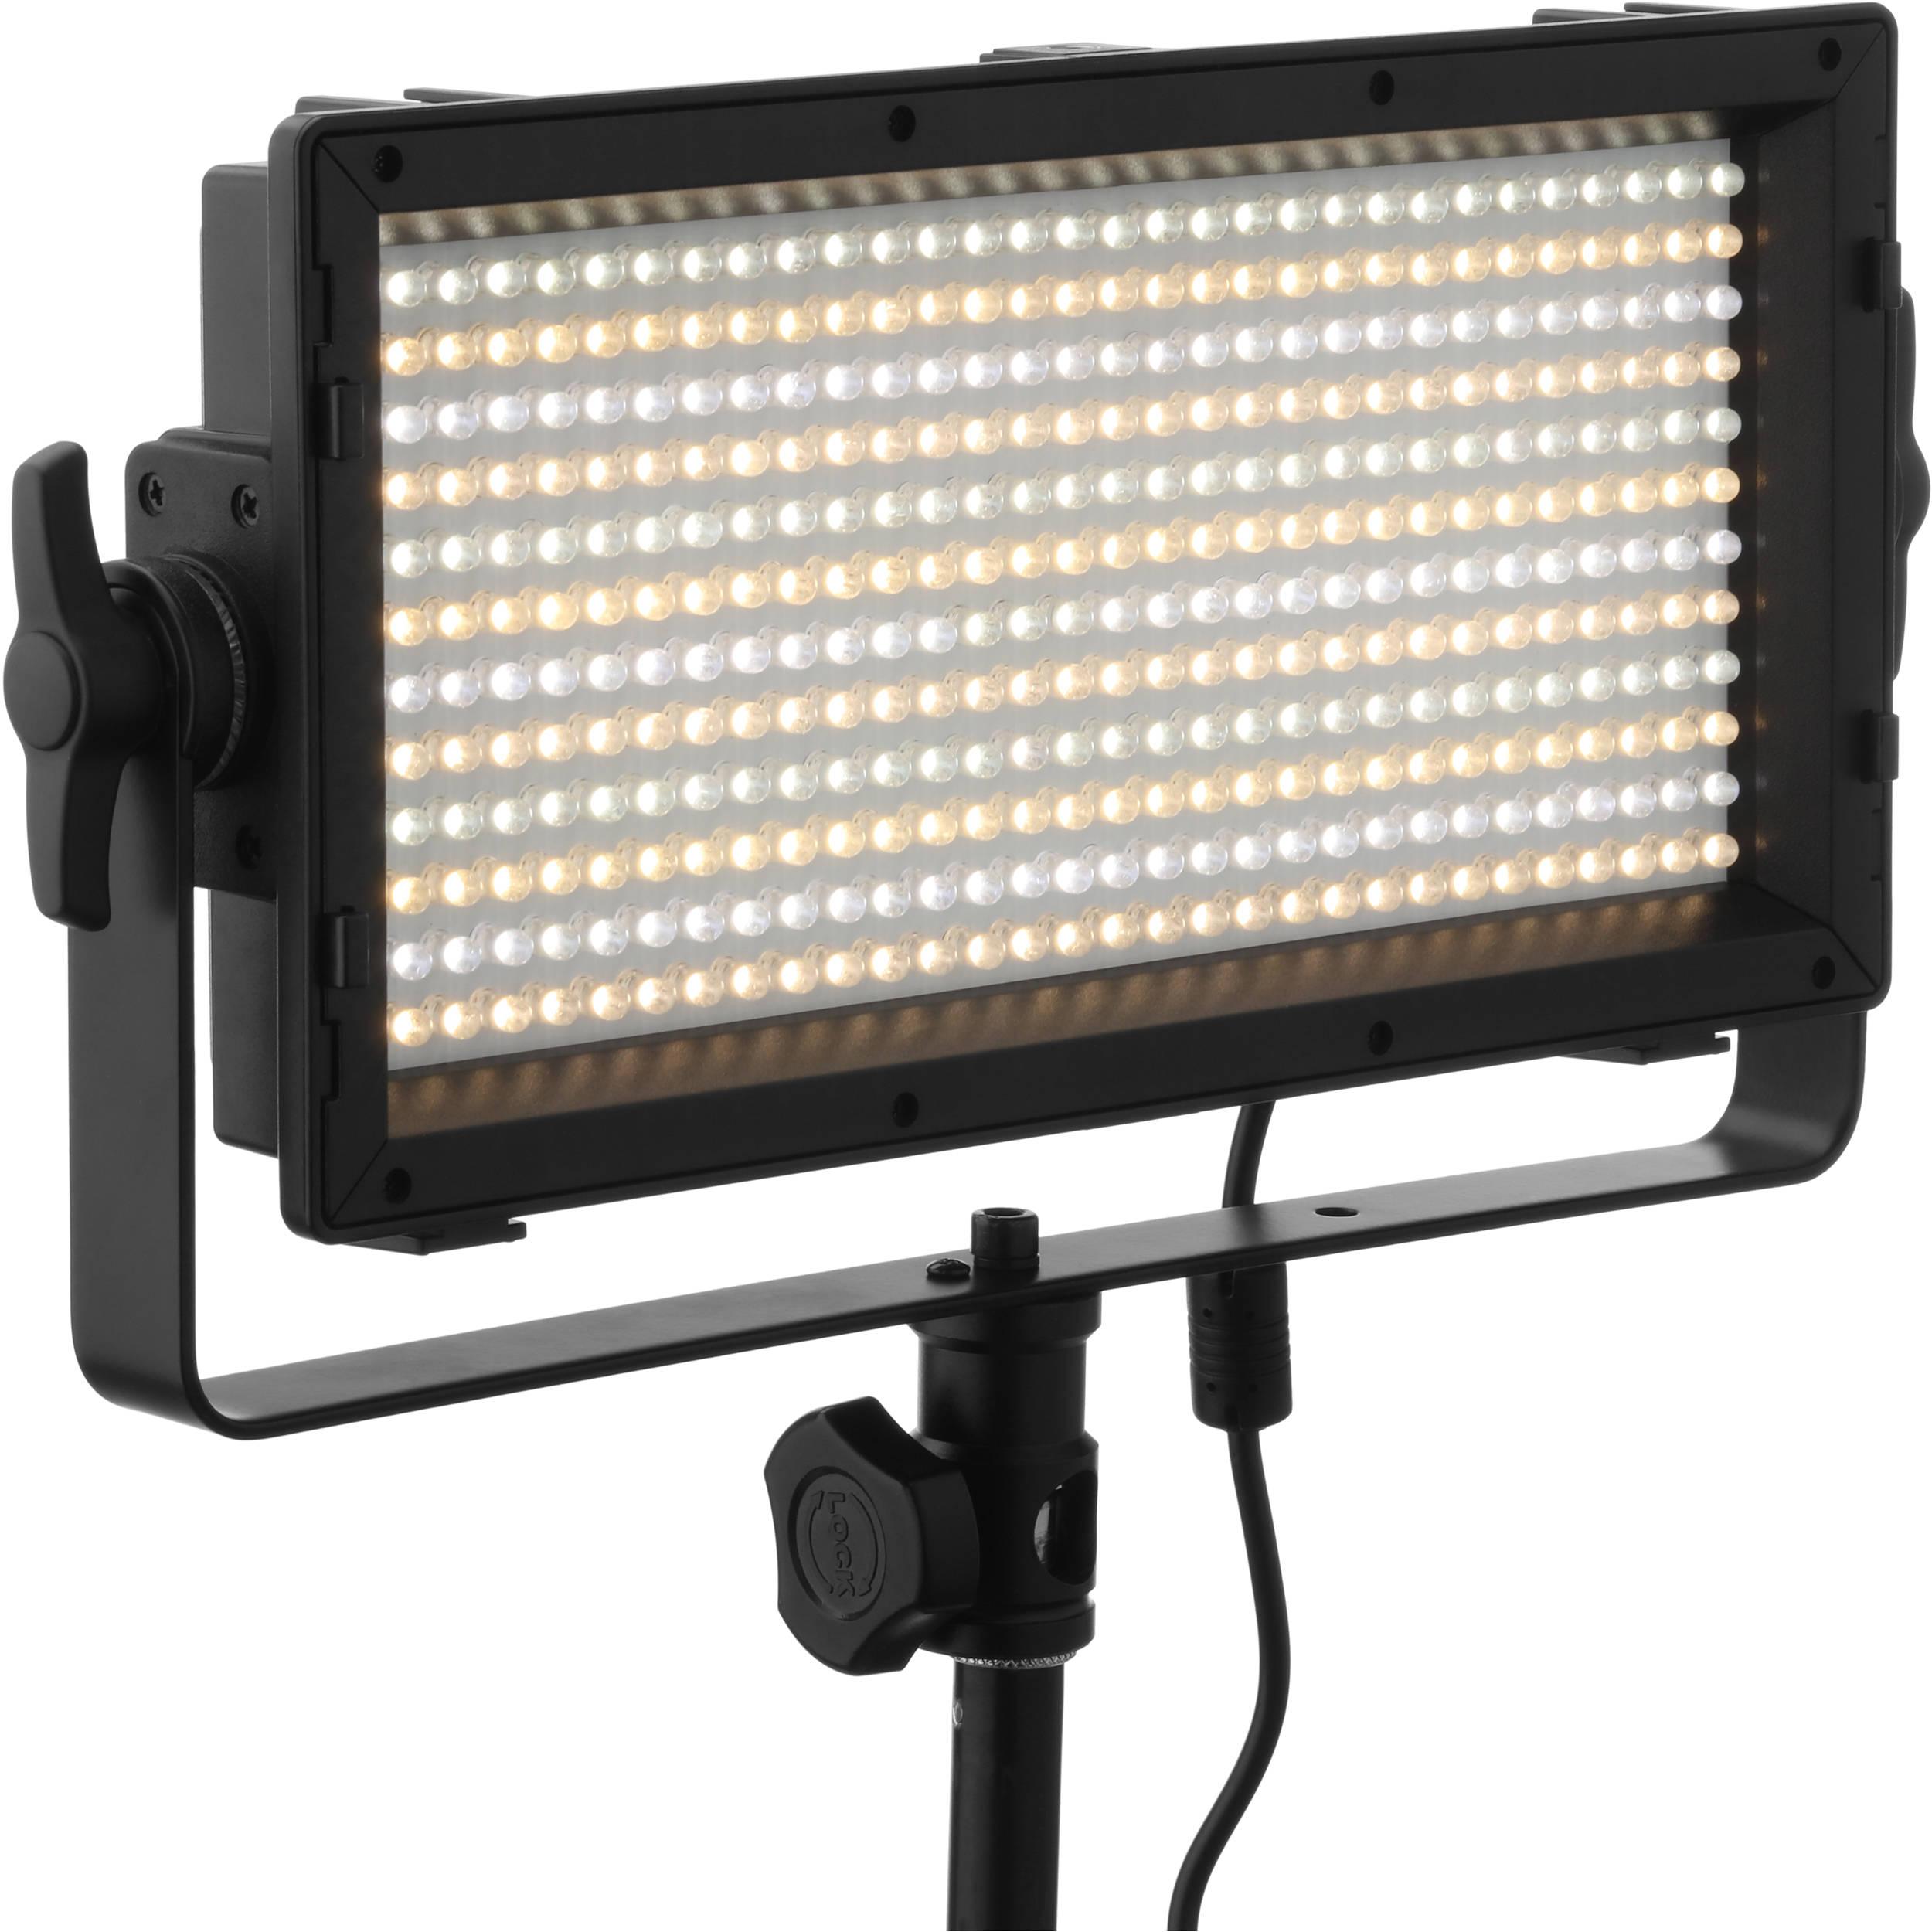 Image result for led light